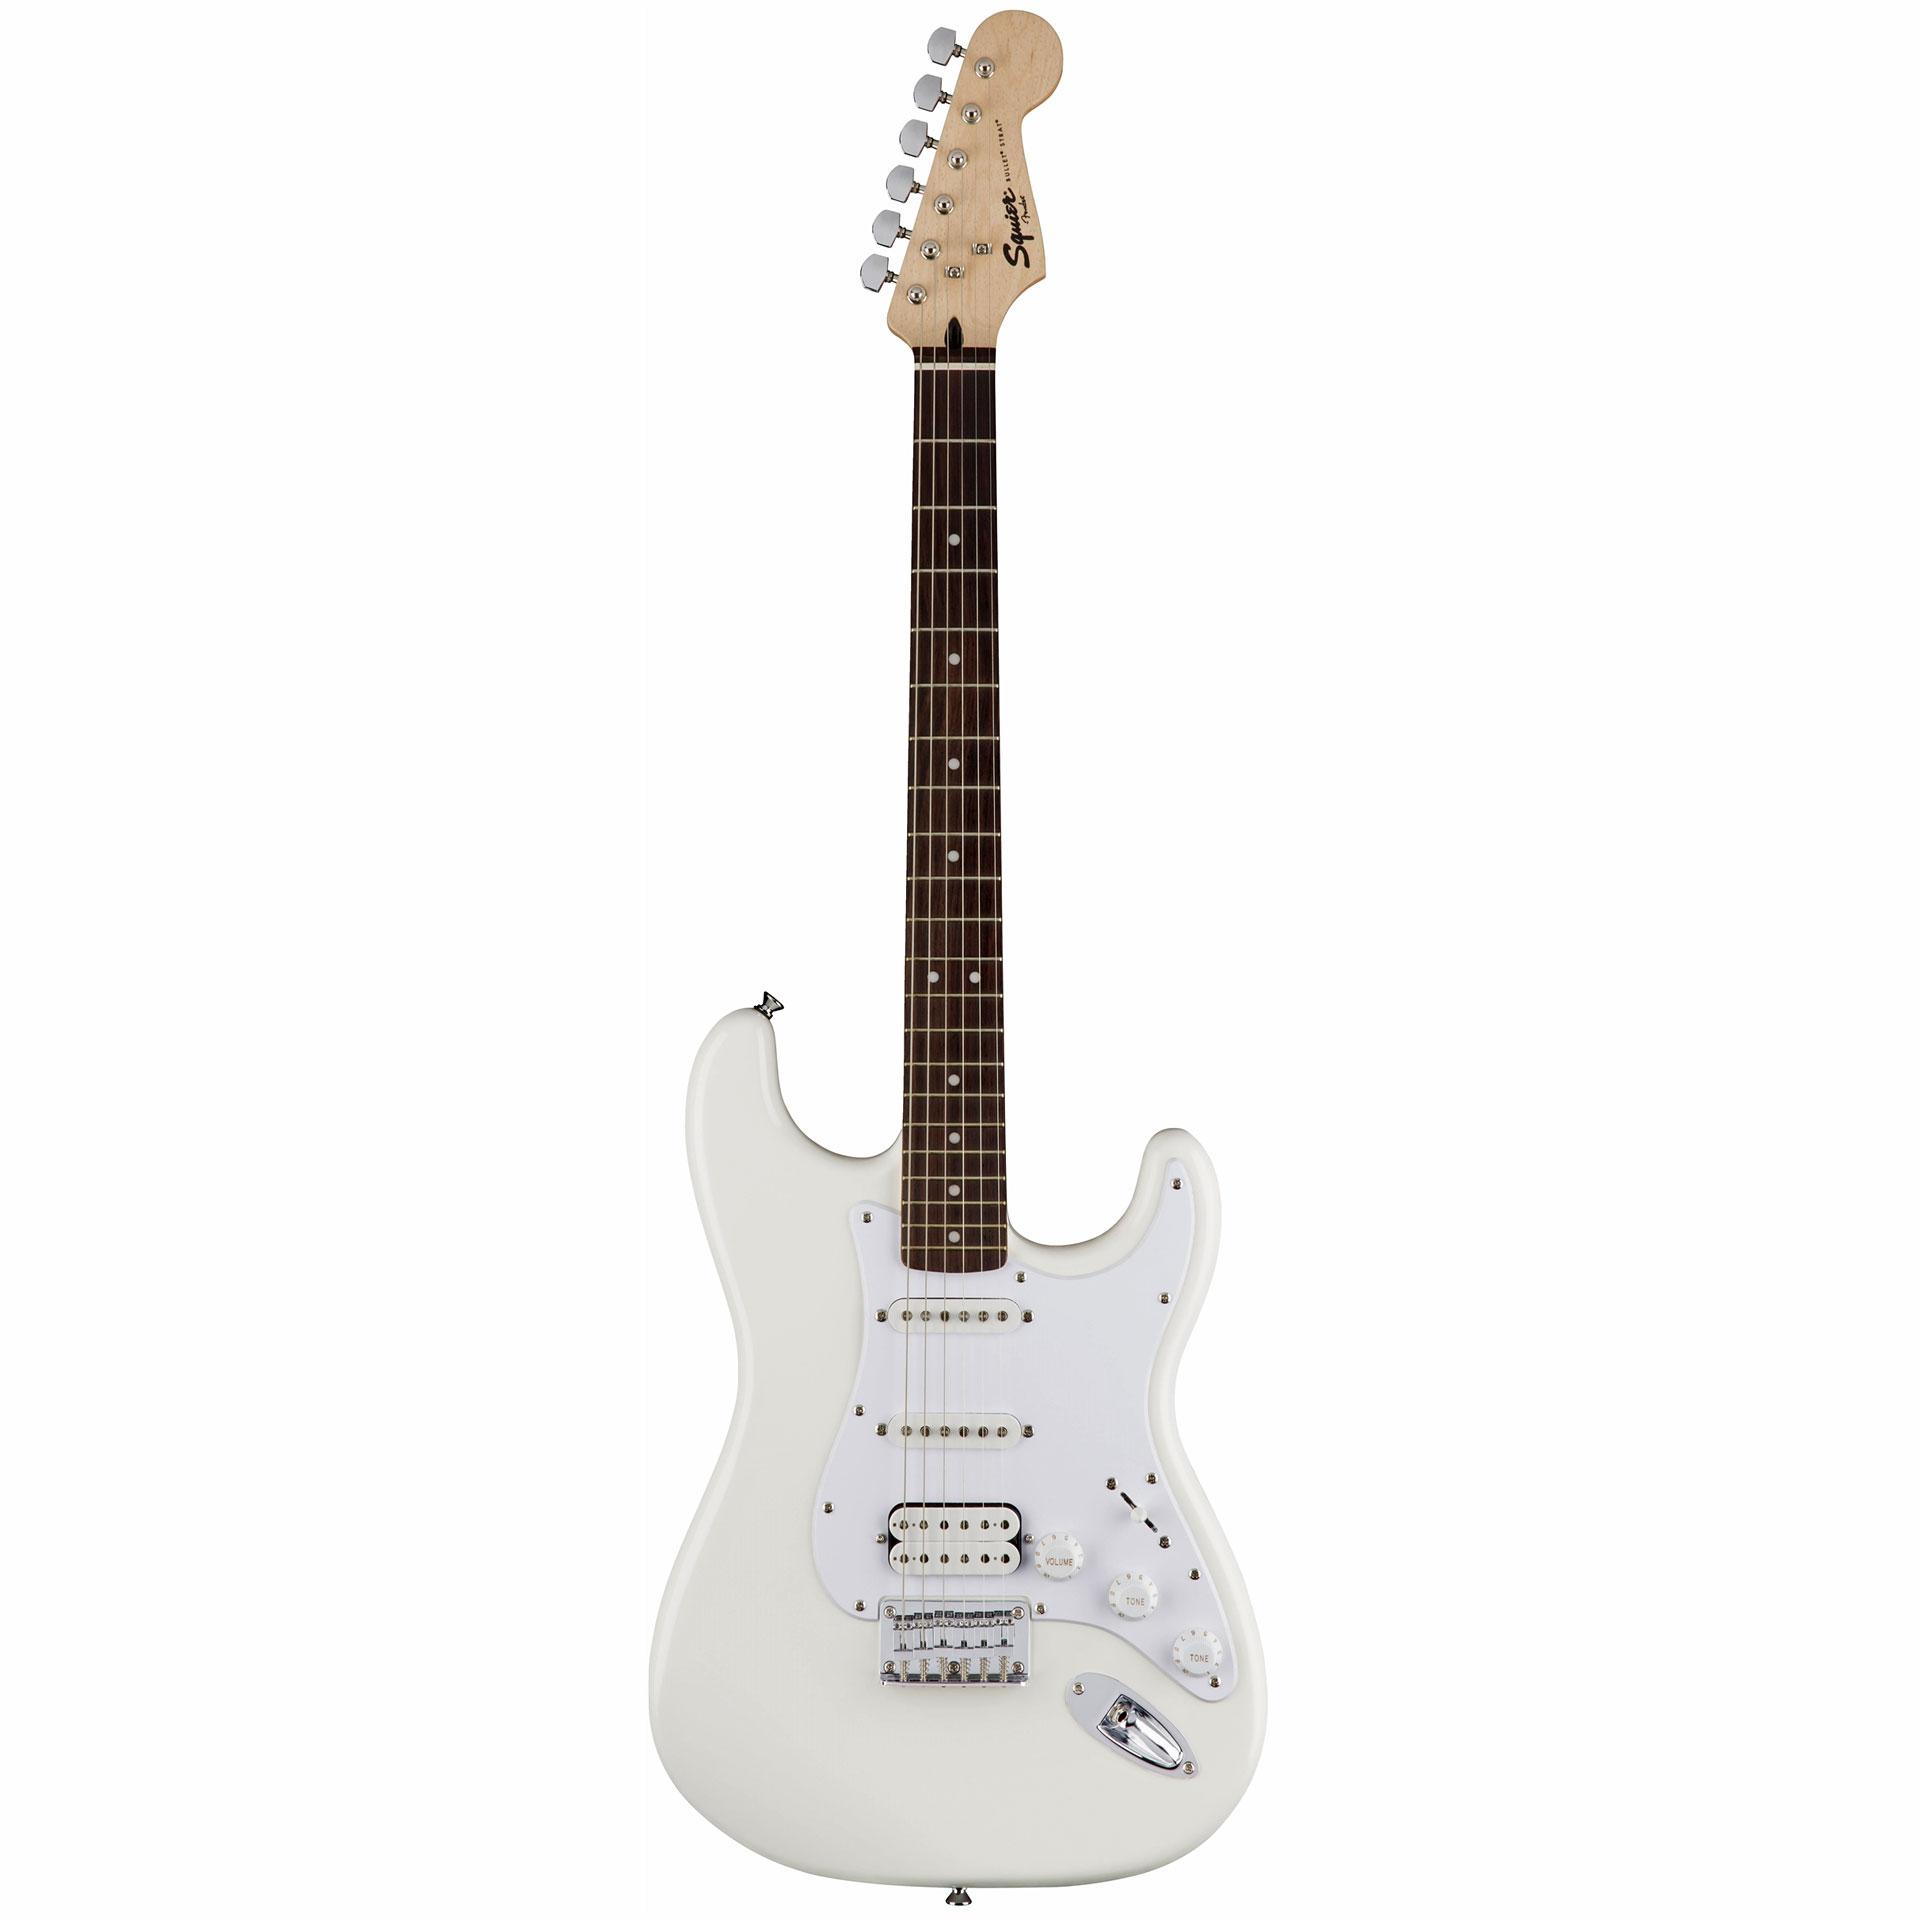 squier bullet strat ht hss awt electric guitar